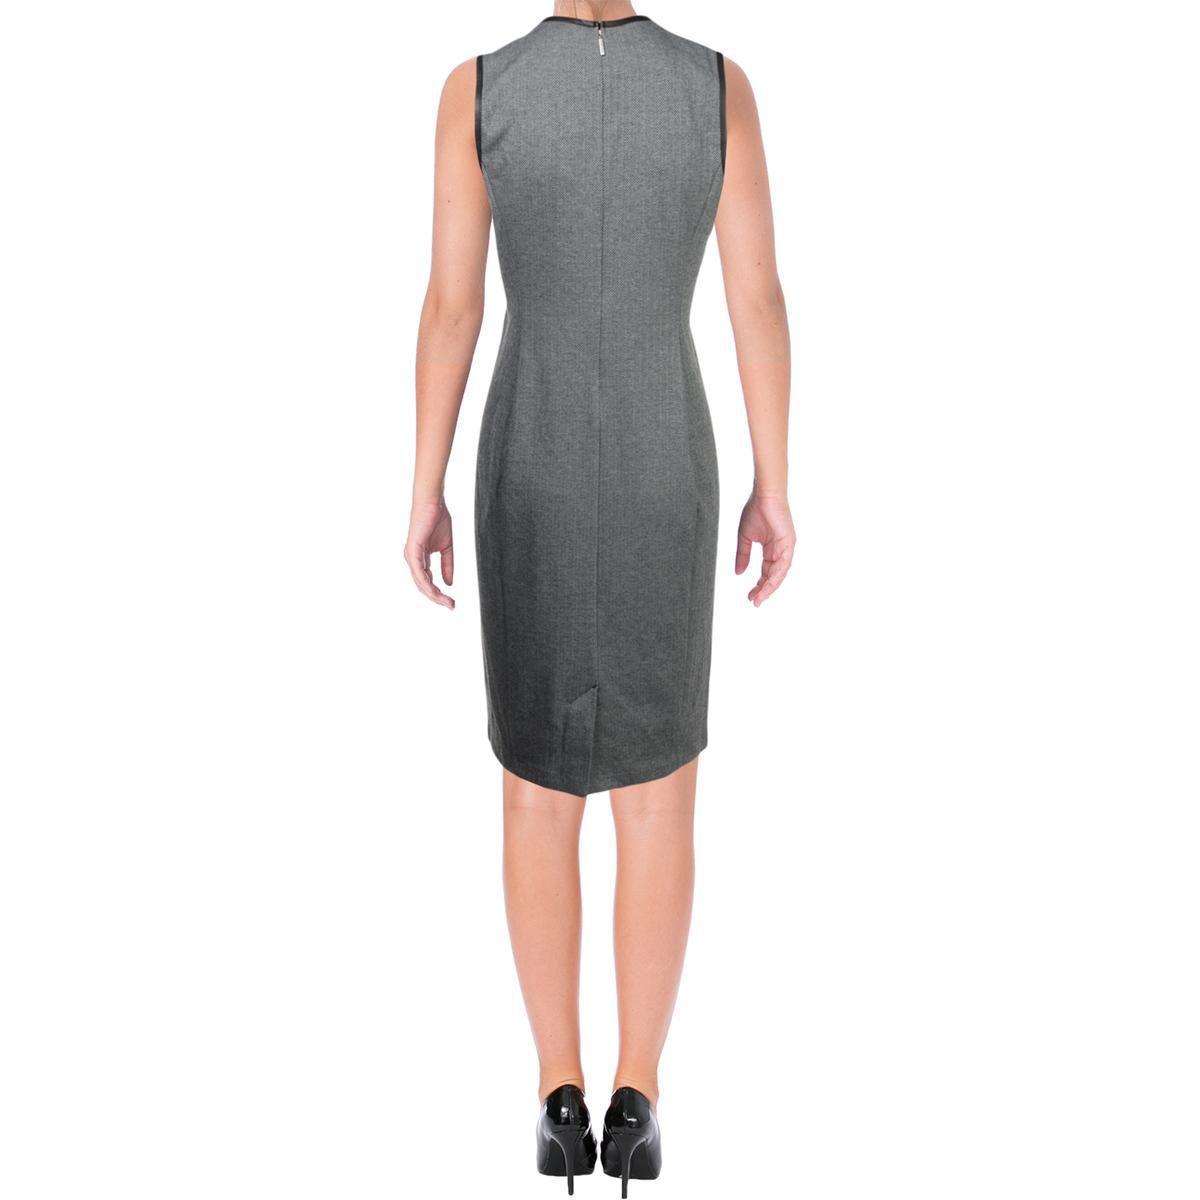 7c82875de59b21 ... Womens Herringbone Faux Leather Trim Wear To Work Dress -. View  fullscreen